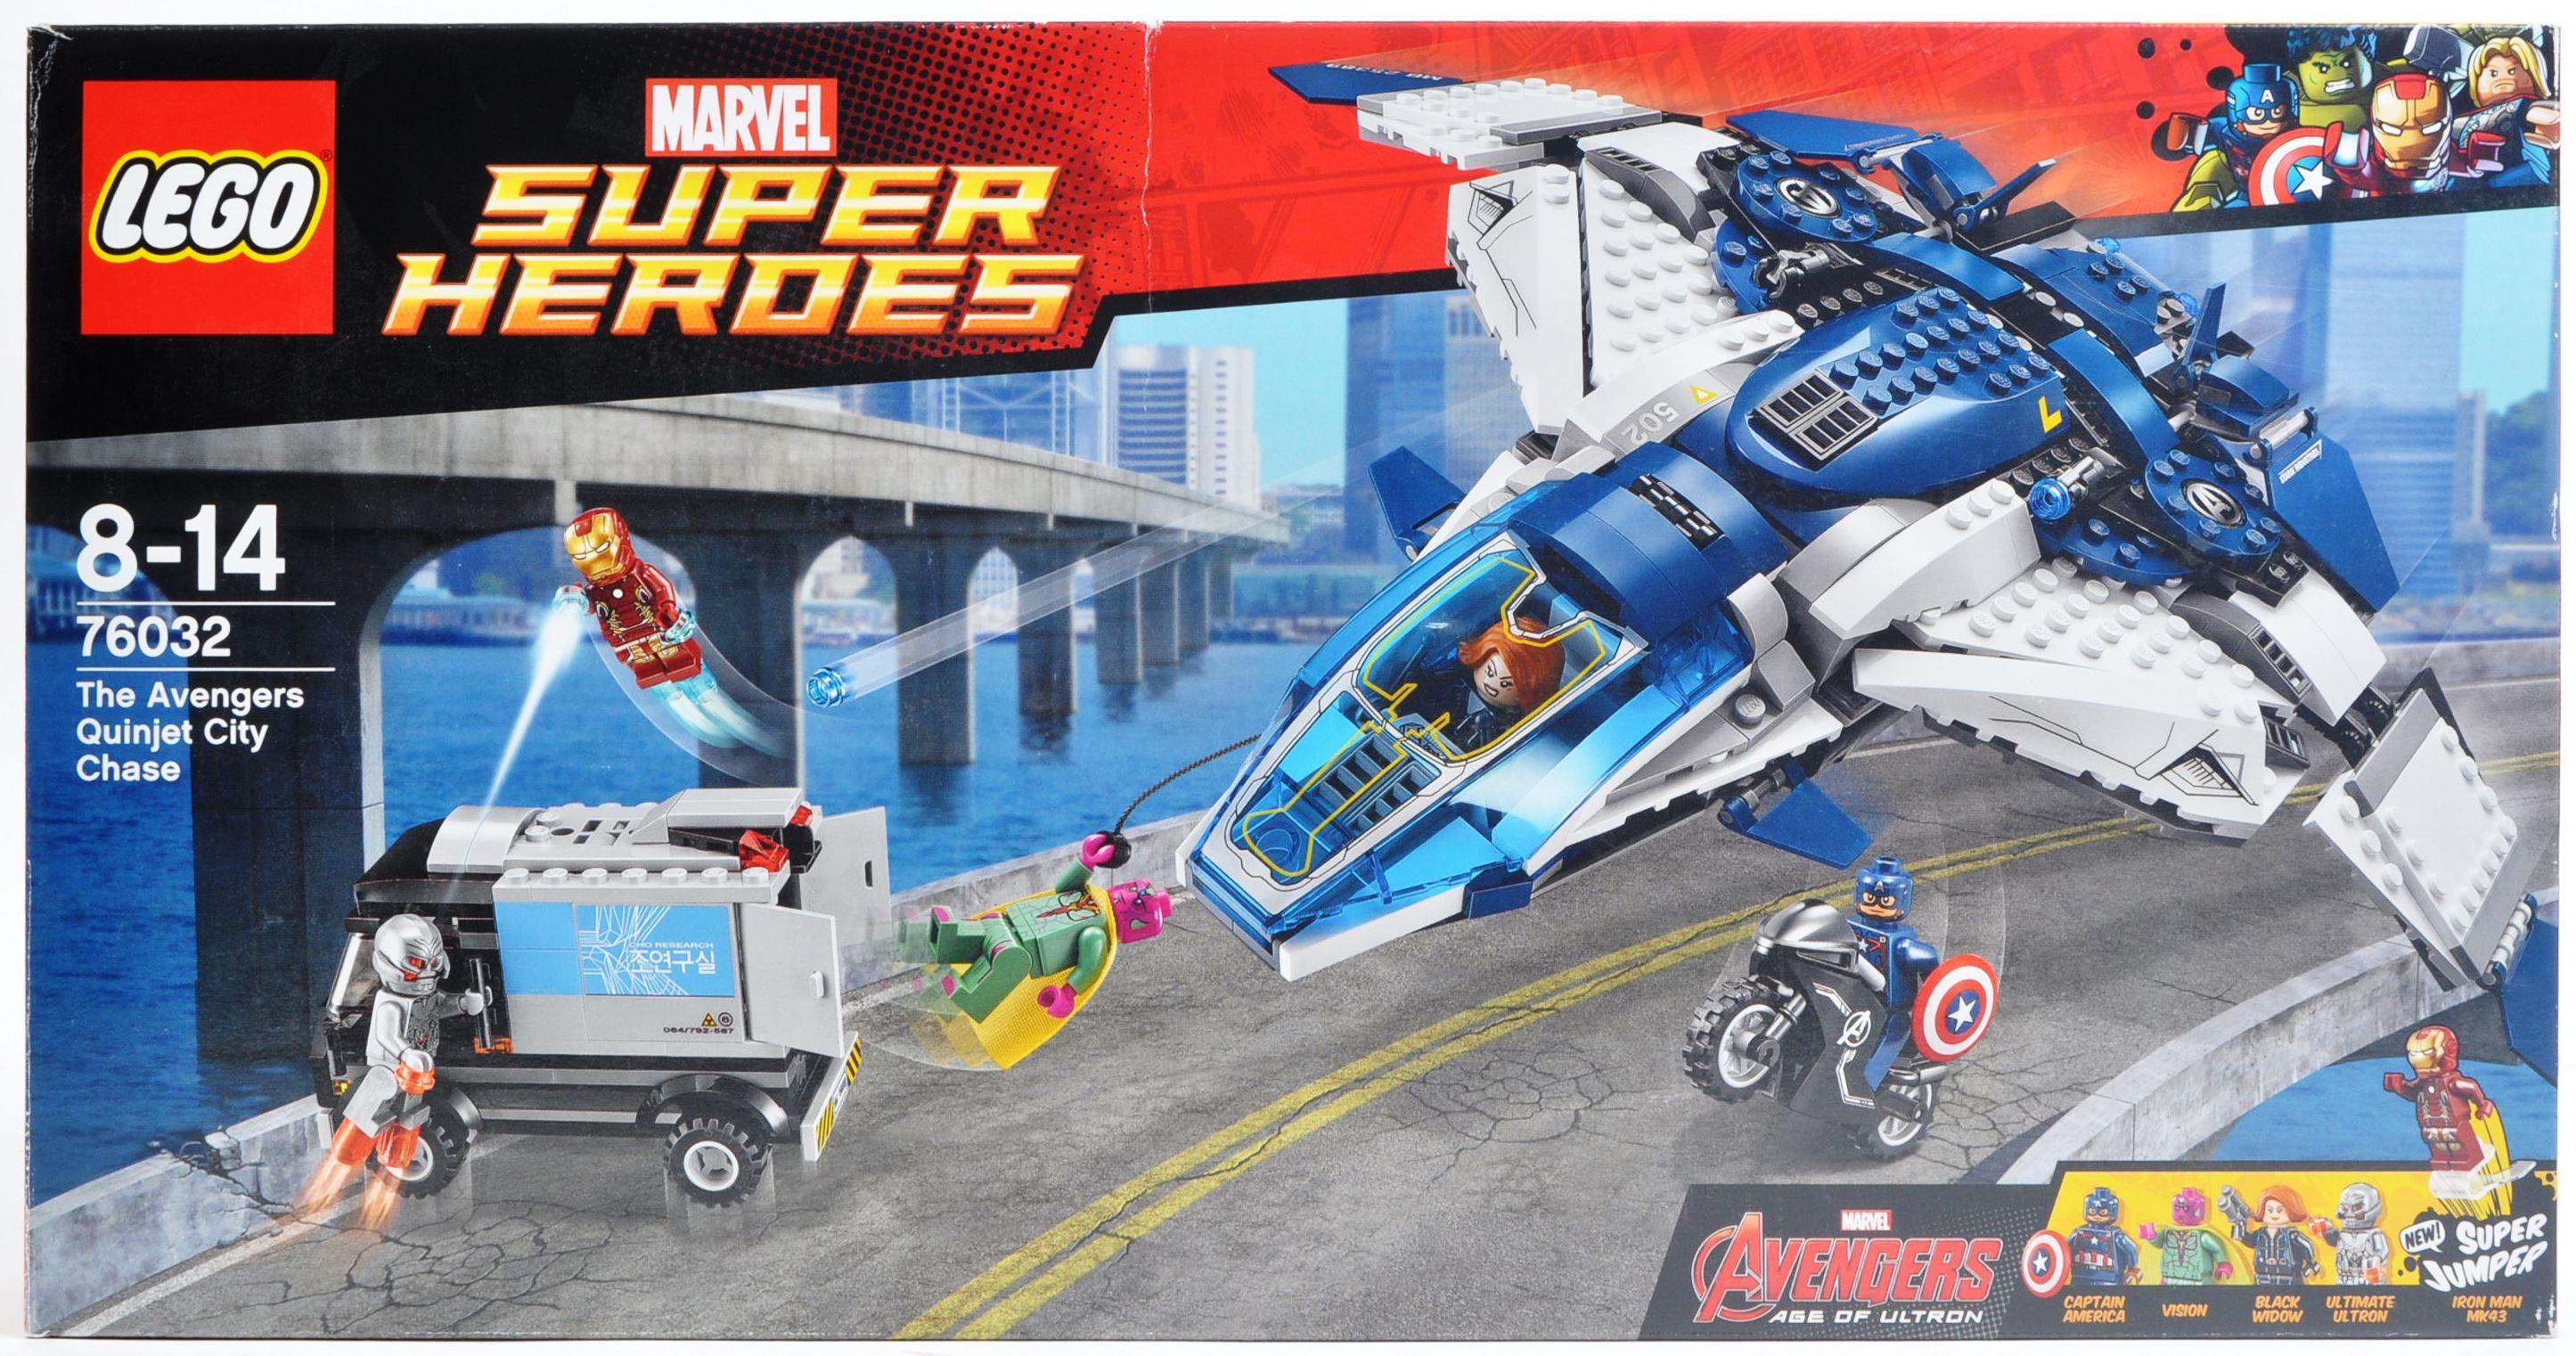 LEGO SET - MARVEL SUPERHEROES - 76032 - AVENGERS QUINJET CITY CHASE